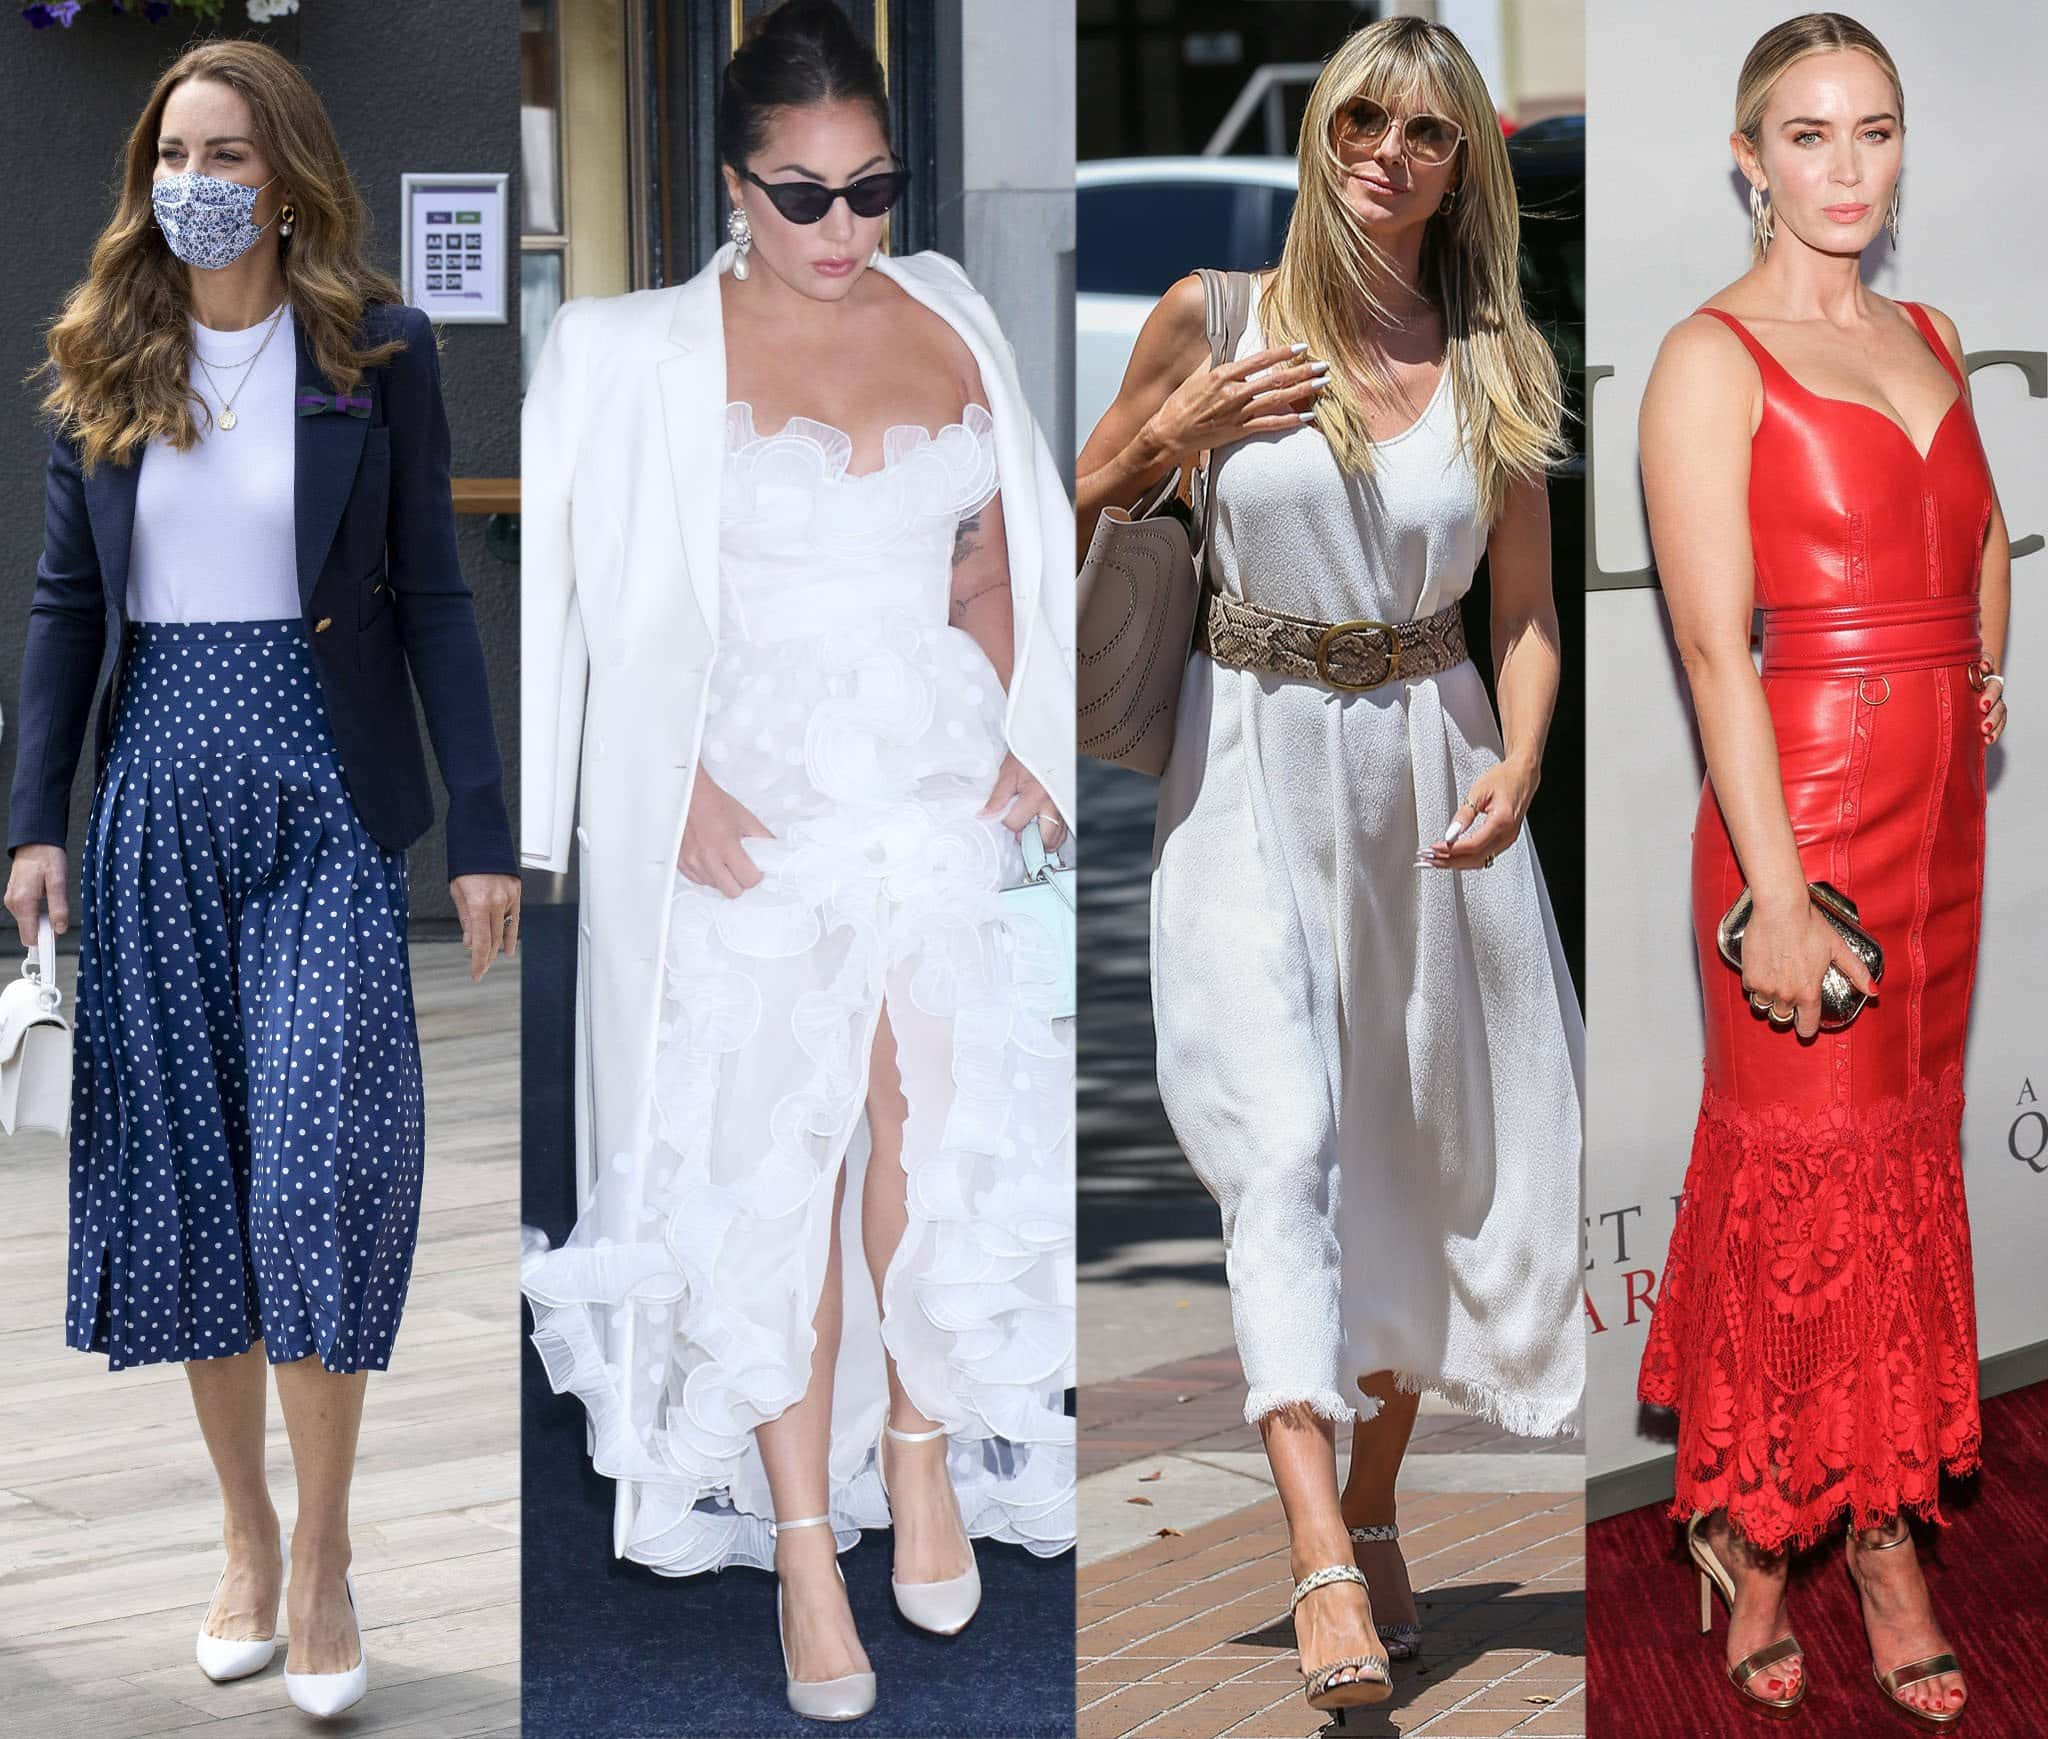 Kate Middleton, Lady Gaga, Heidi Klum, and Emily Blunt wearing Jimmy Choos